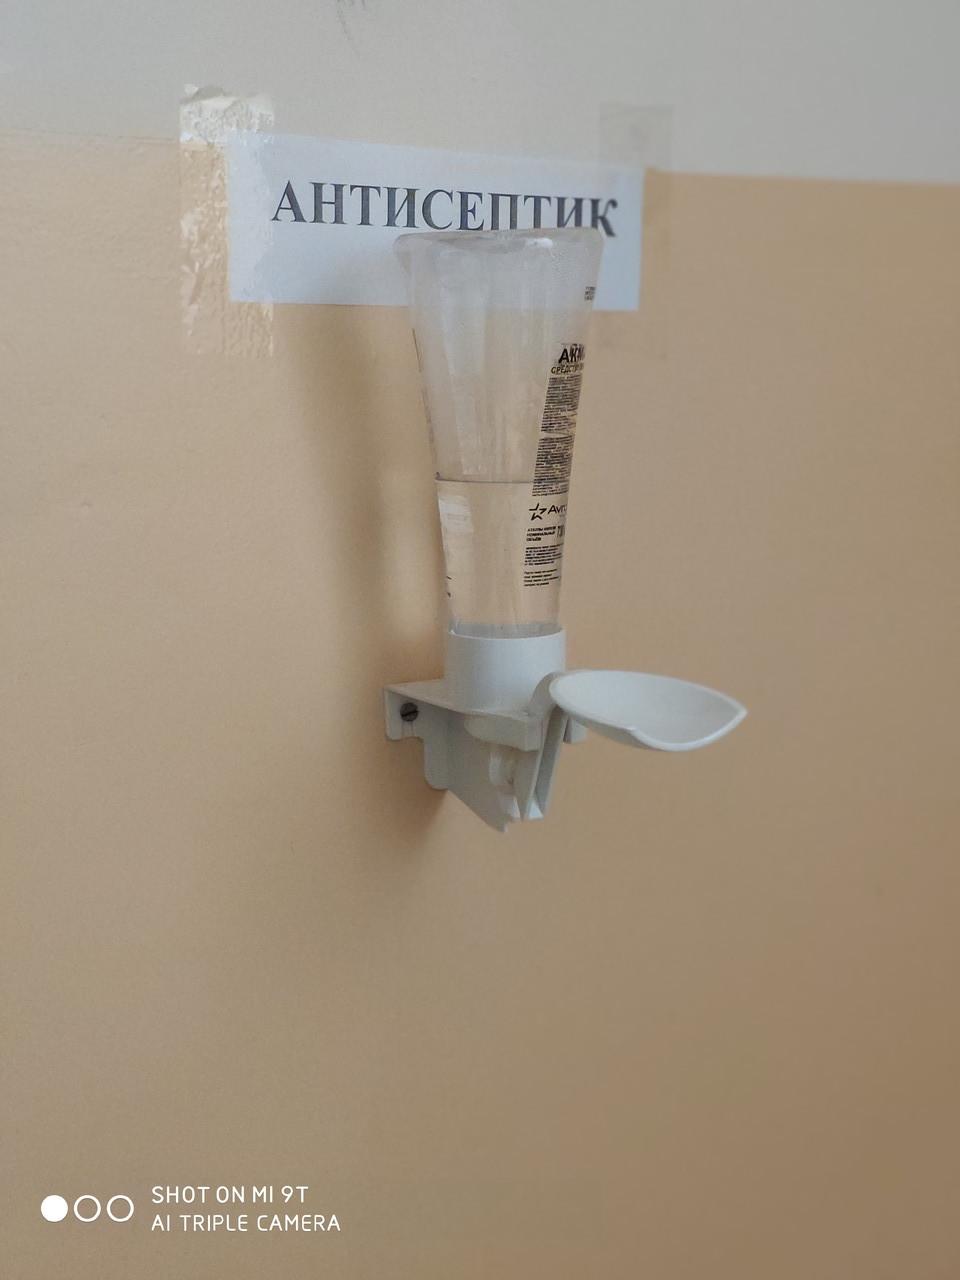 Локтевой дозатор + антисептик 70%-й (730 мл)